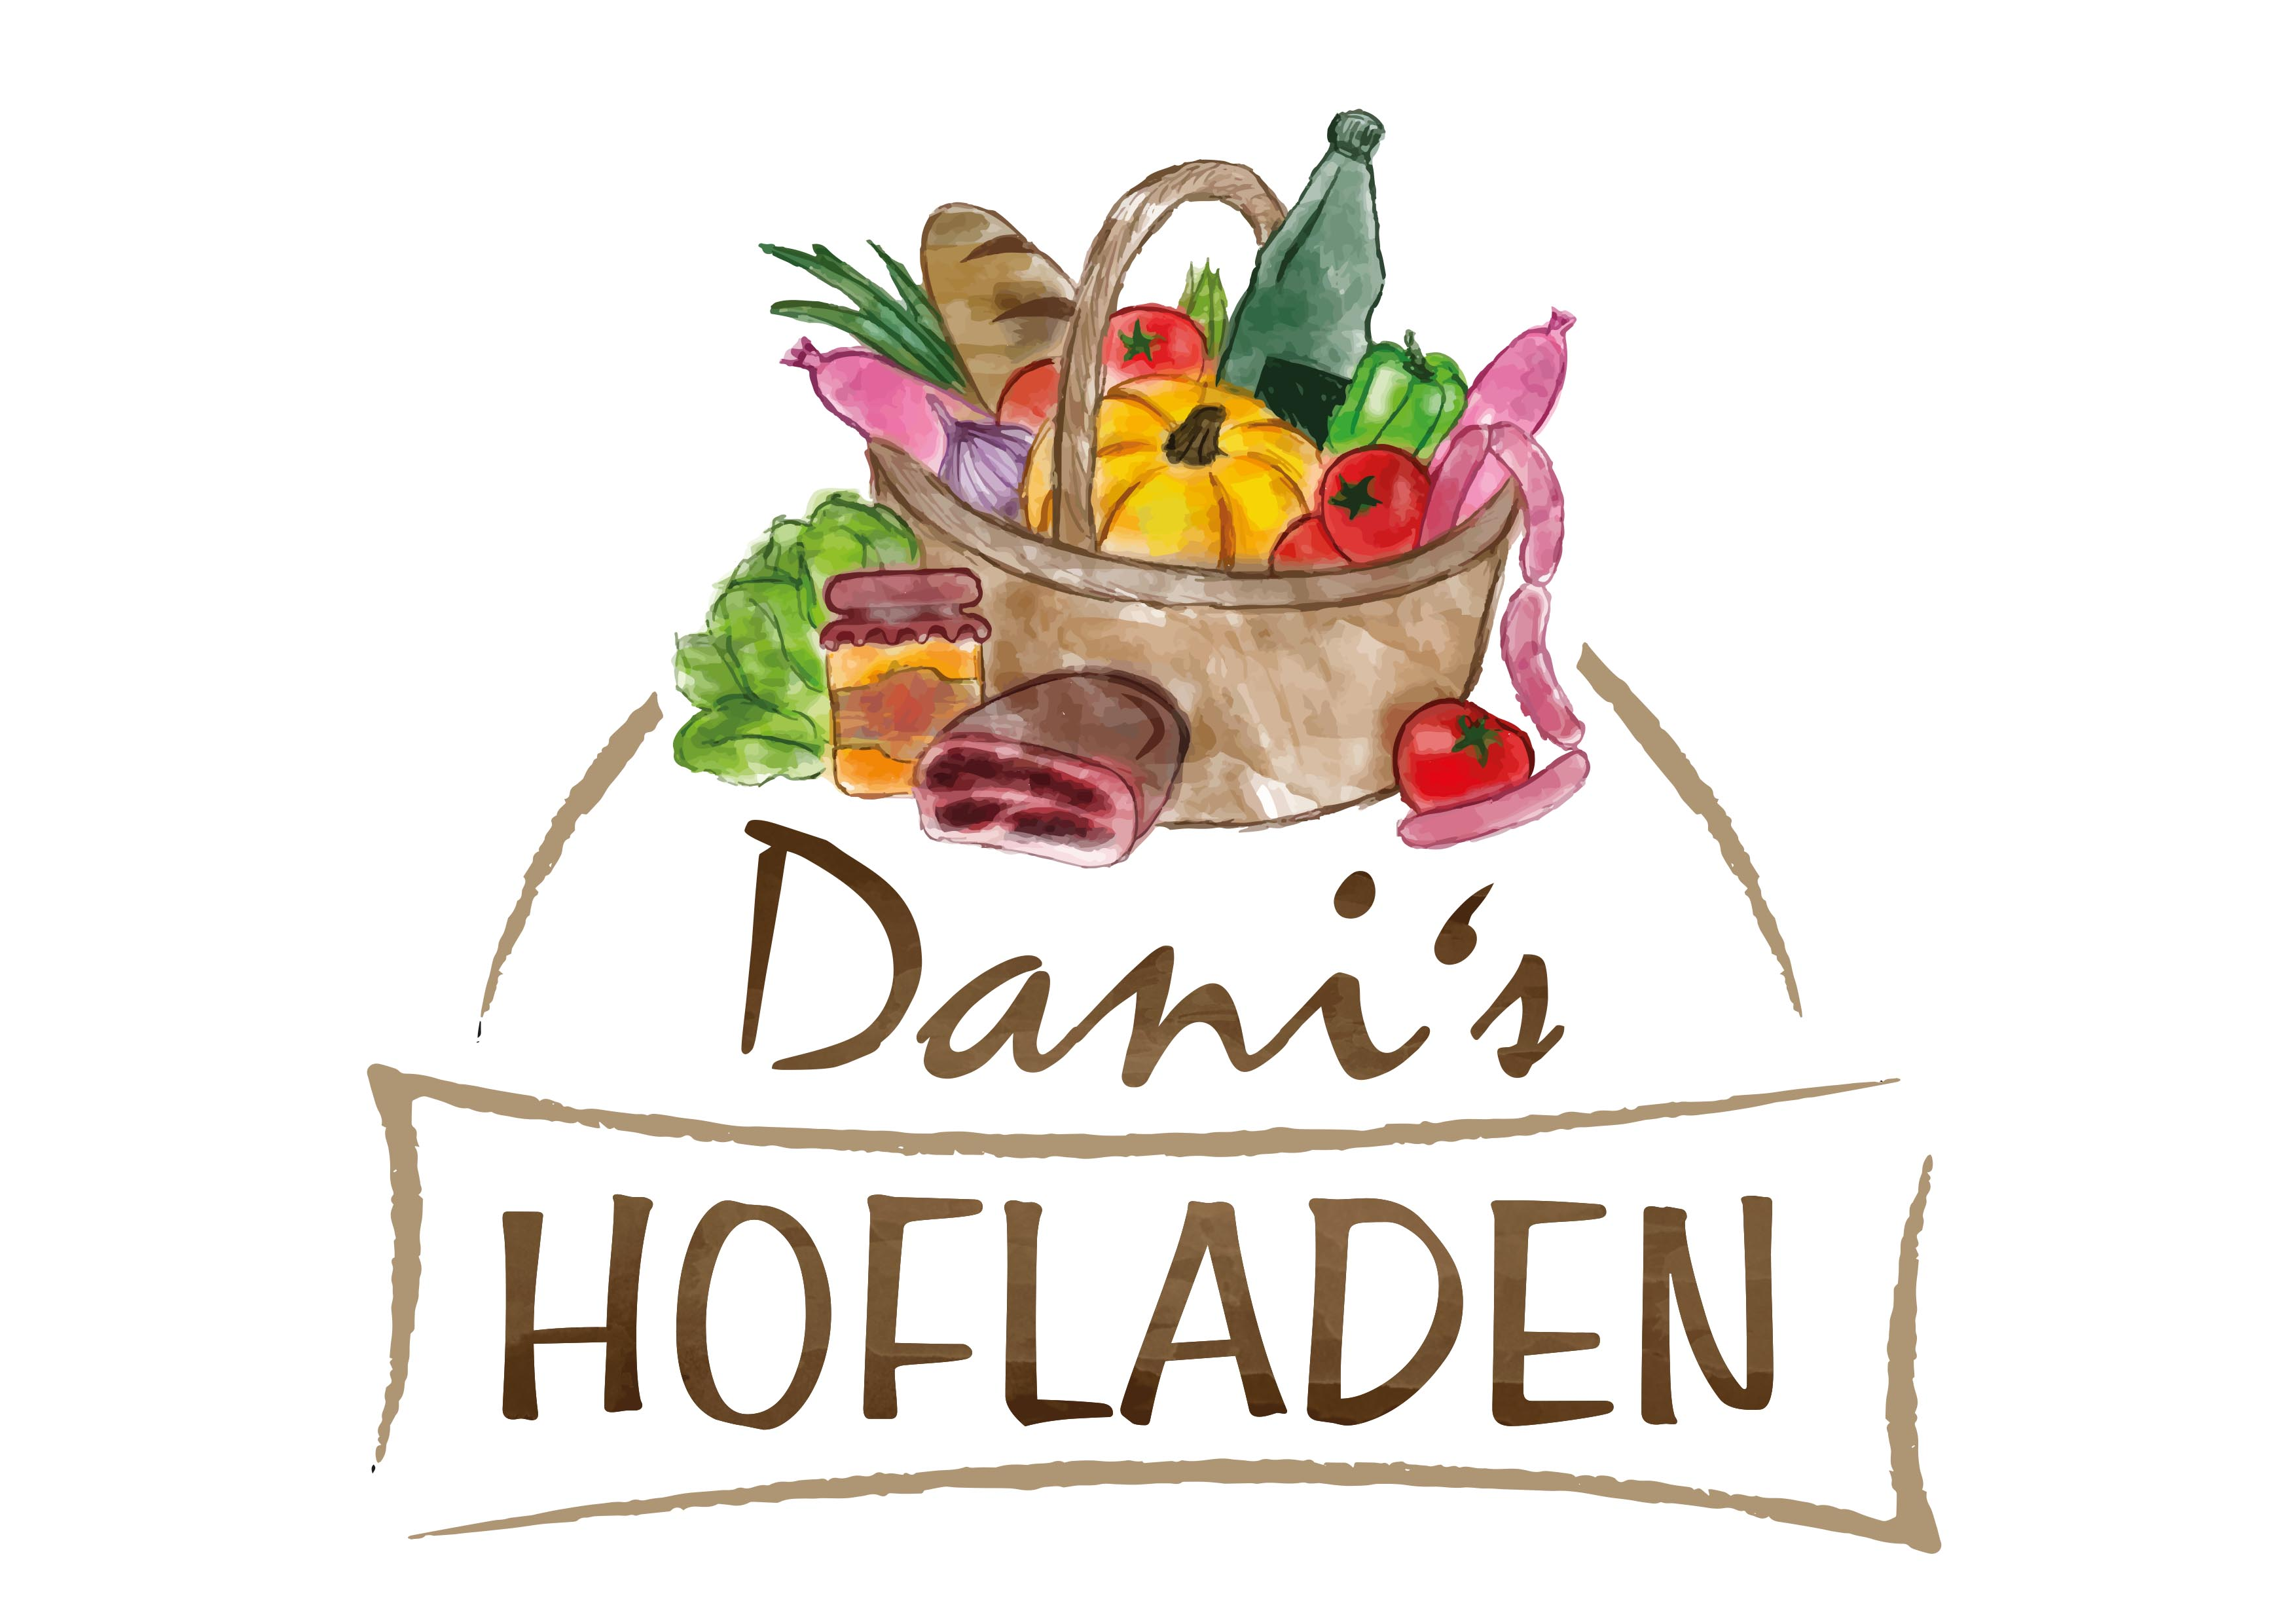 Danis-Hofladen-Marke-4C-OK